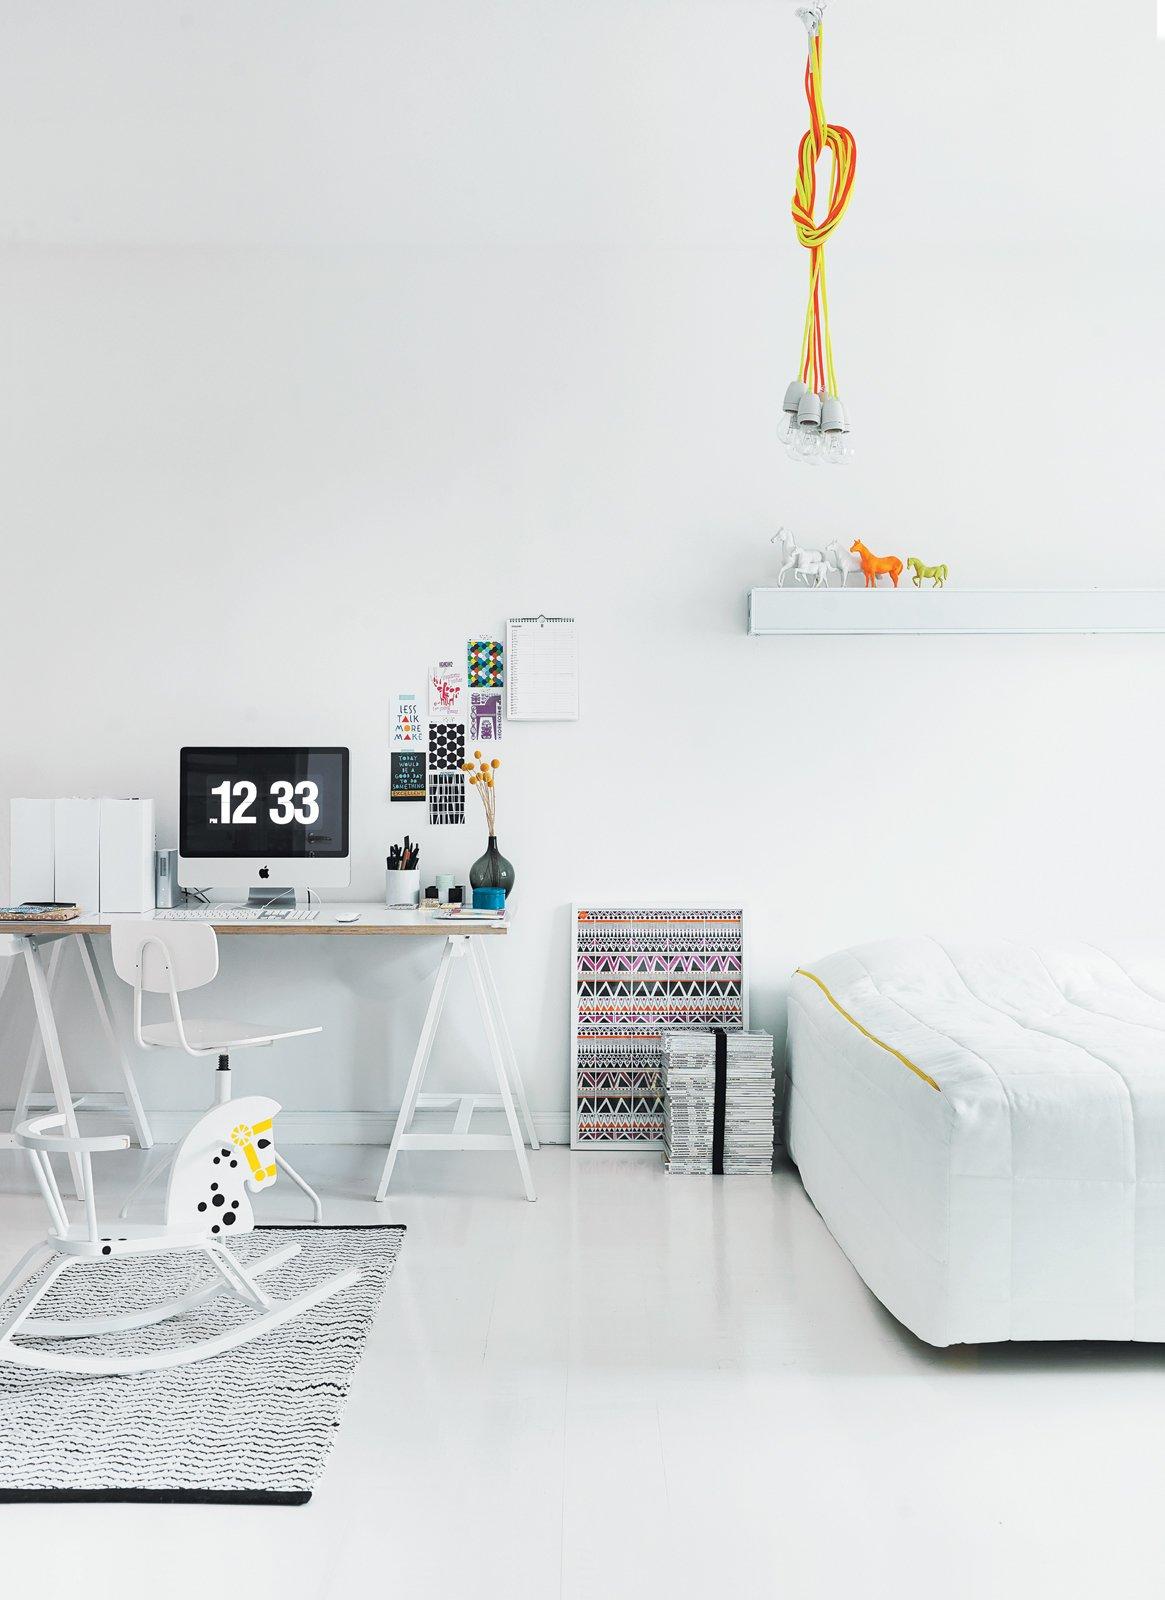 #interior #design #interiordesign #masterbedroom #couchbed #ikea #ikeadesk #rockingchair #rockinghorse #modern #budget #susannavento #jussivento #helsinki #apartment #cozy #quirky #whiteinterior #white #palette #blackaccents #neon #glow #trestledesk #desk #huuto #homeoffice #lighting #chordlights #chordpendantlight   36+ Interior Color Pop Ideas For Modern Homes